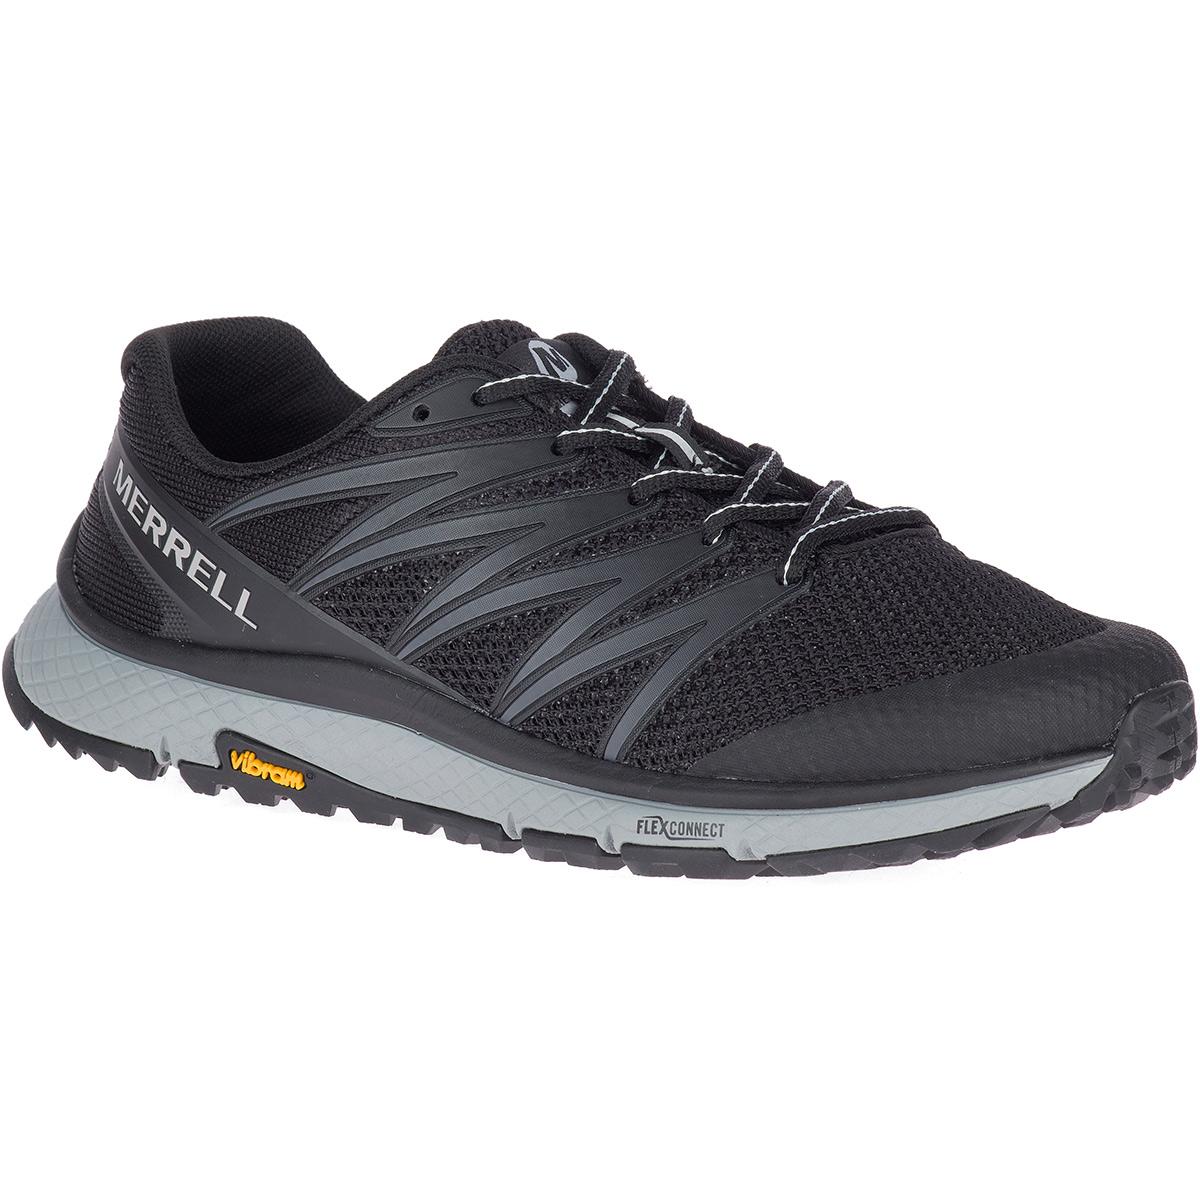 Merrell Women's Bare Access Xtr Trail Running Shoes - Black, 9.5